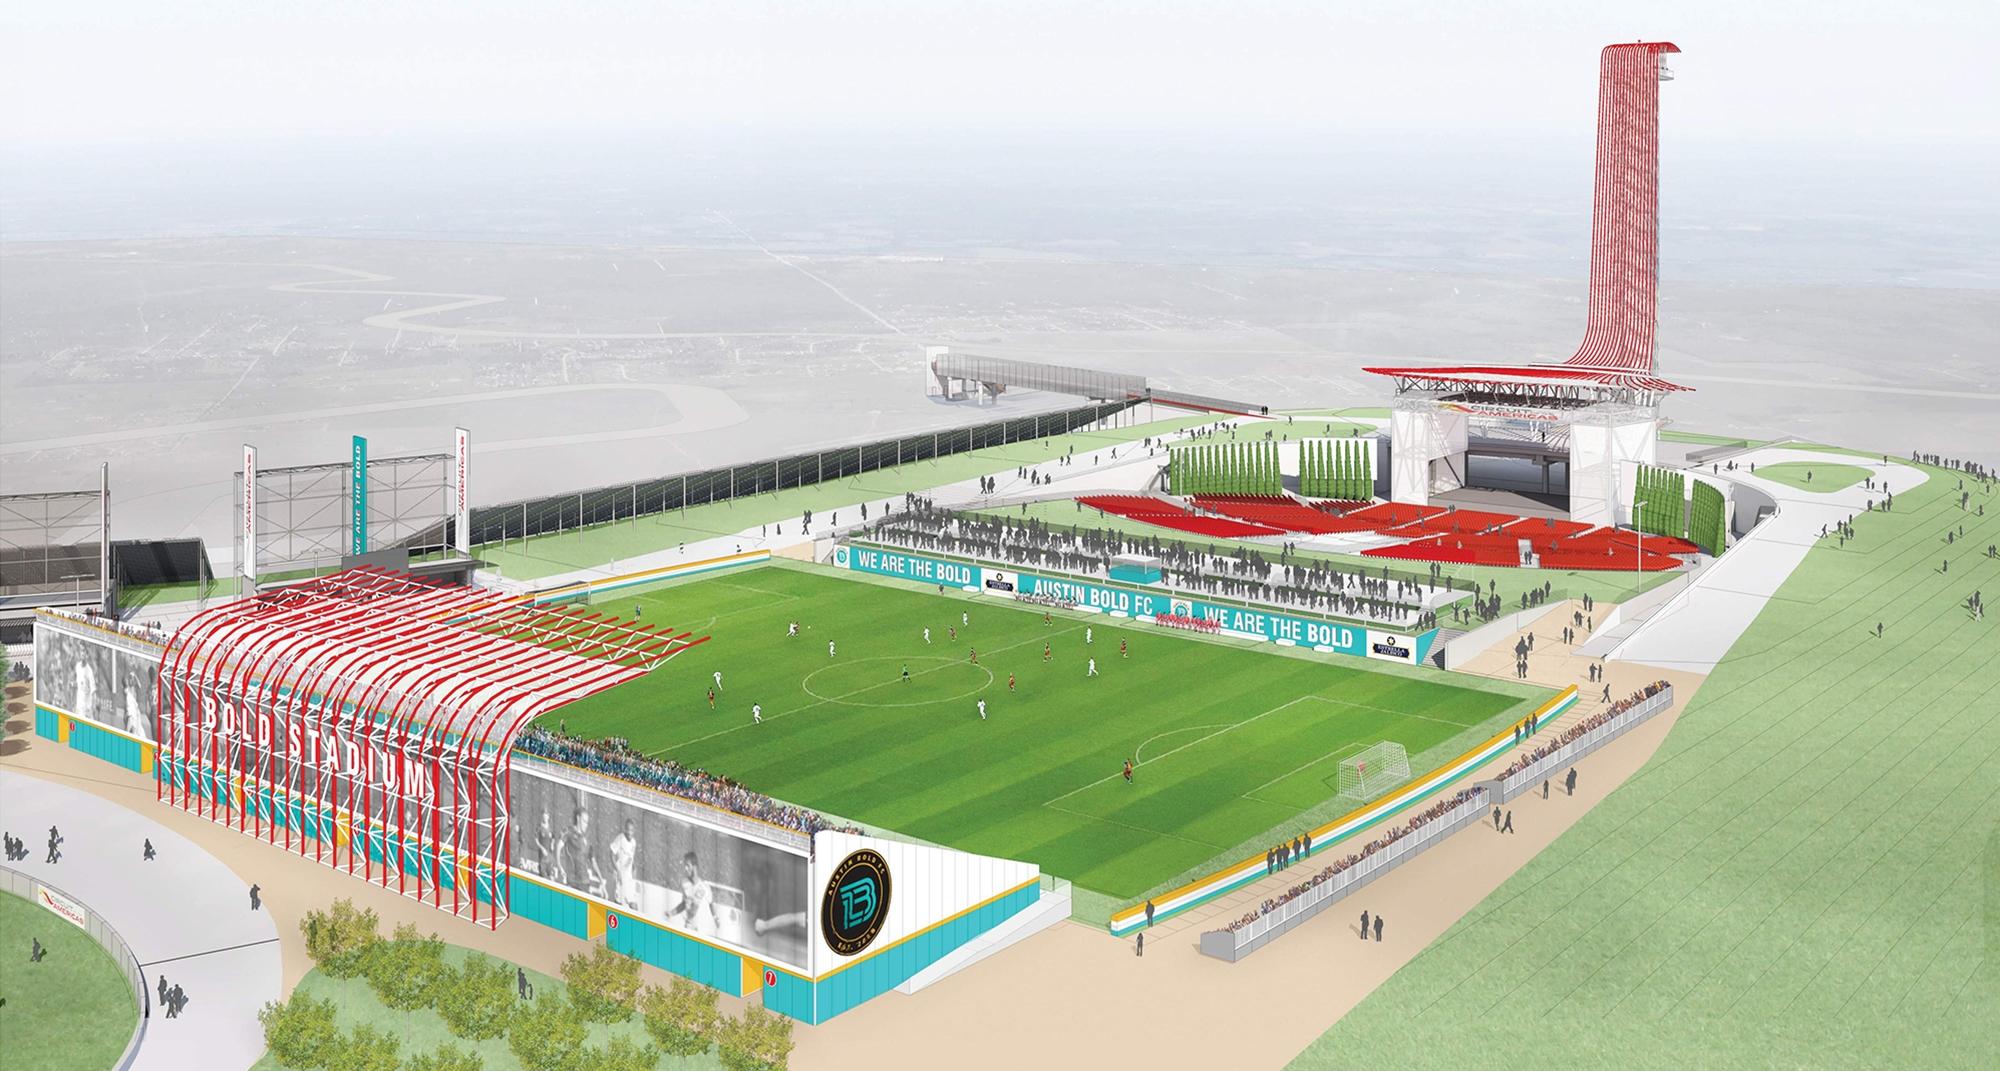 USL Stadium_01.jpg